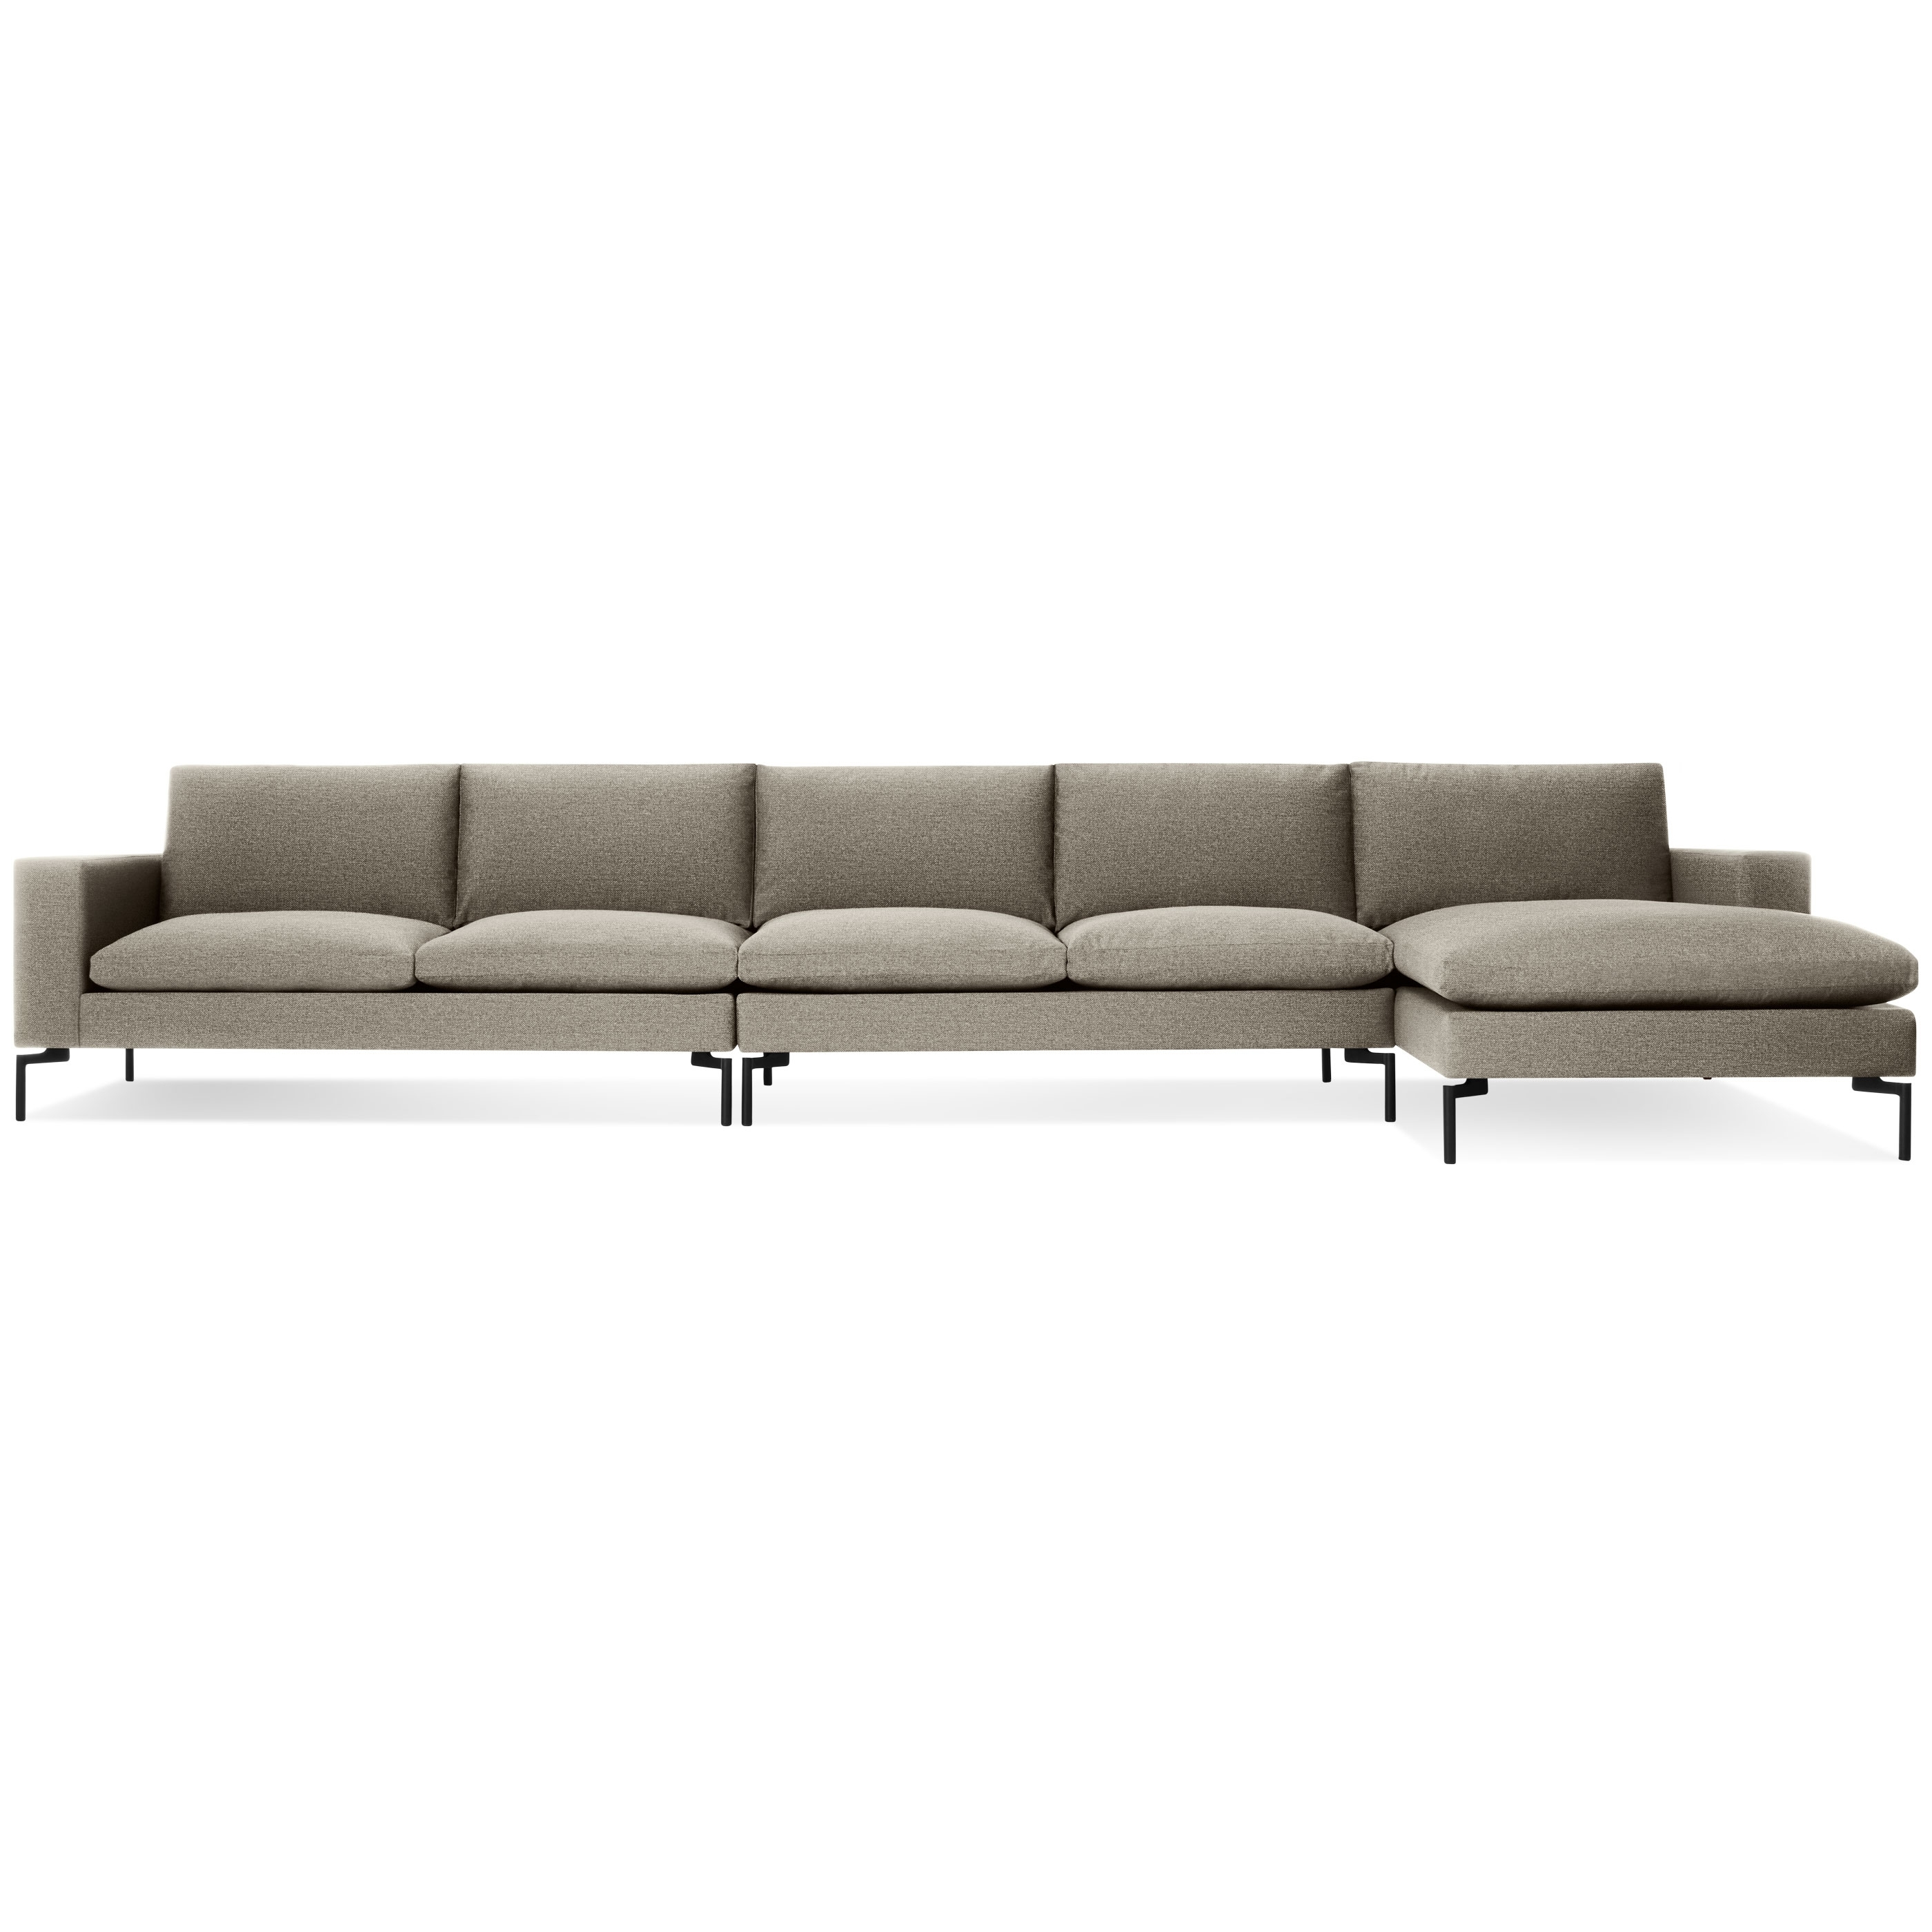 New Standard Medium Sectional Sofa   Modern Sectional Sofas | Blu Dot For Modern Sectional Sofas (Photo 10 of 10)